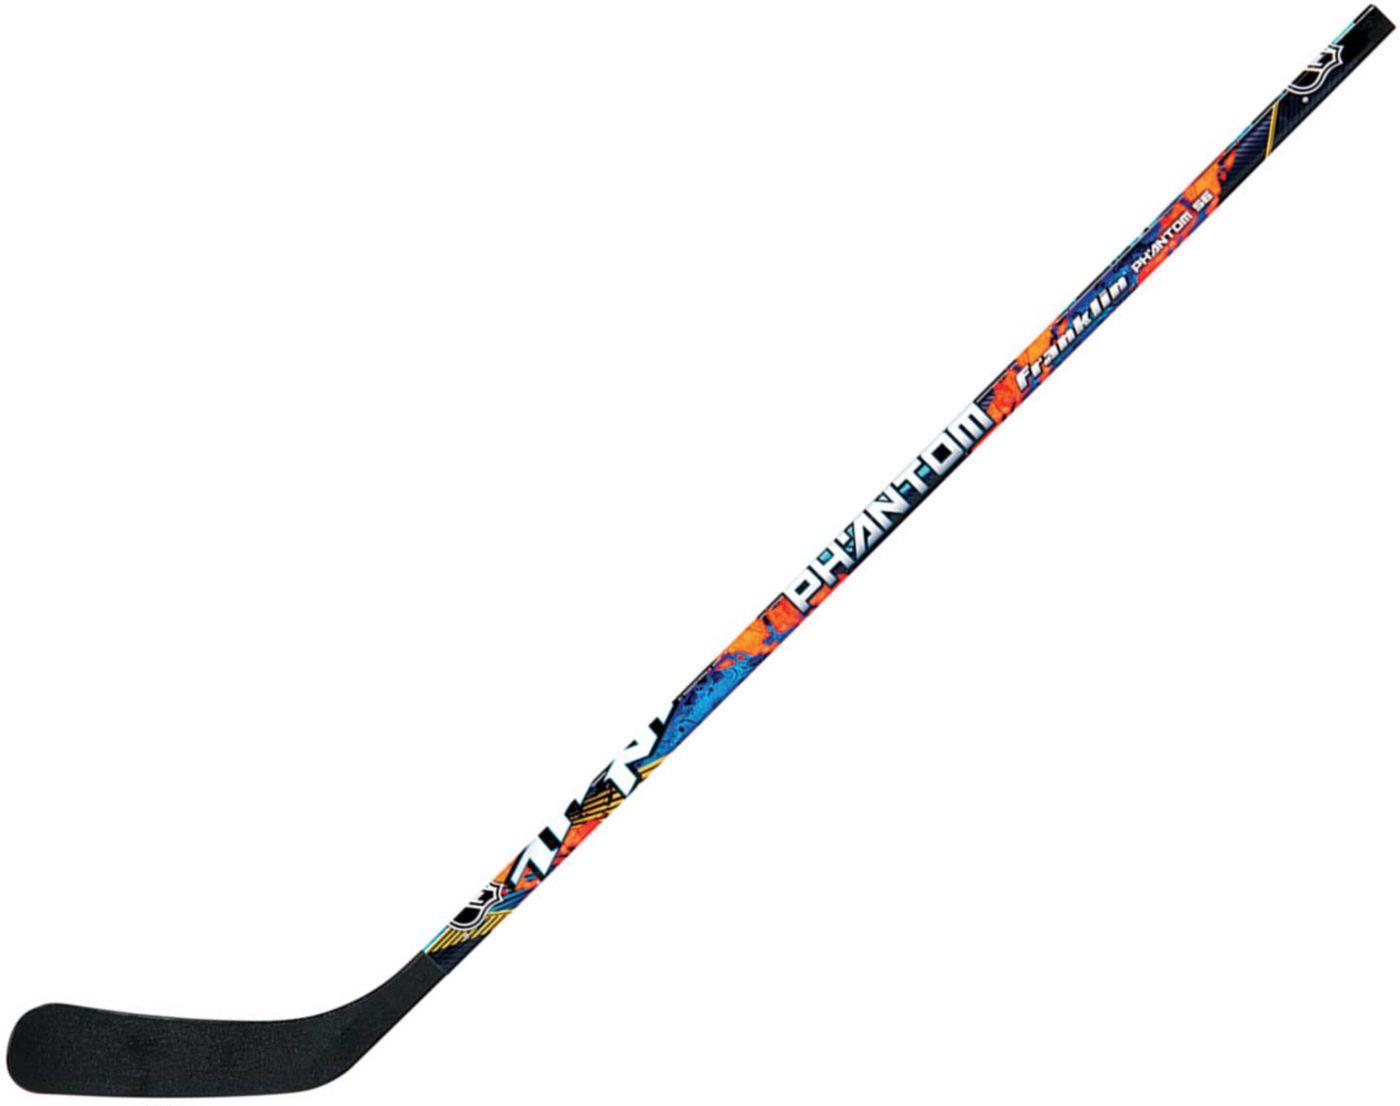 Franklin Junior Phantom 1090 Street Hockey Stick